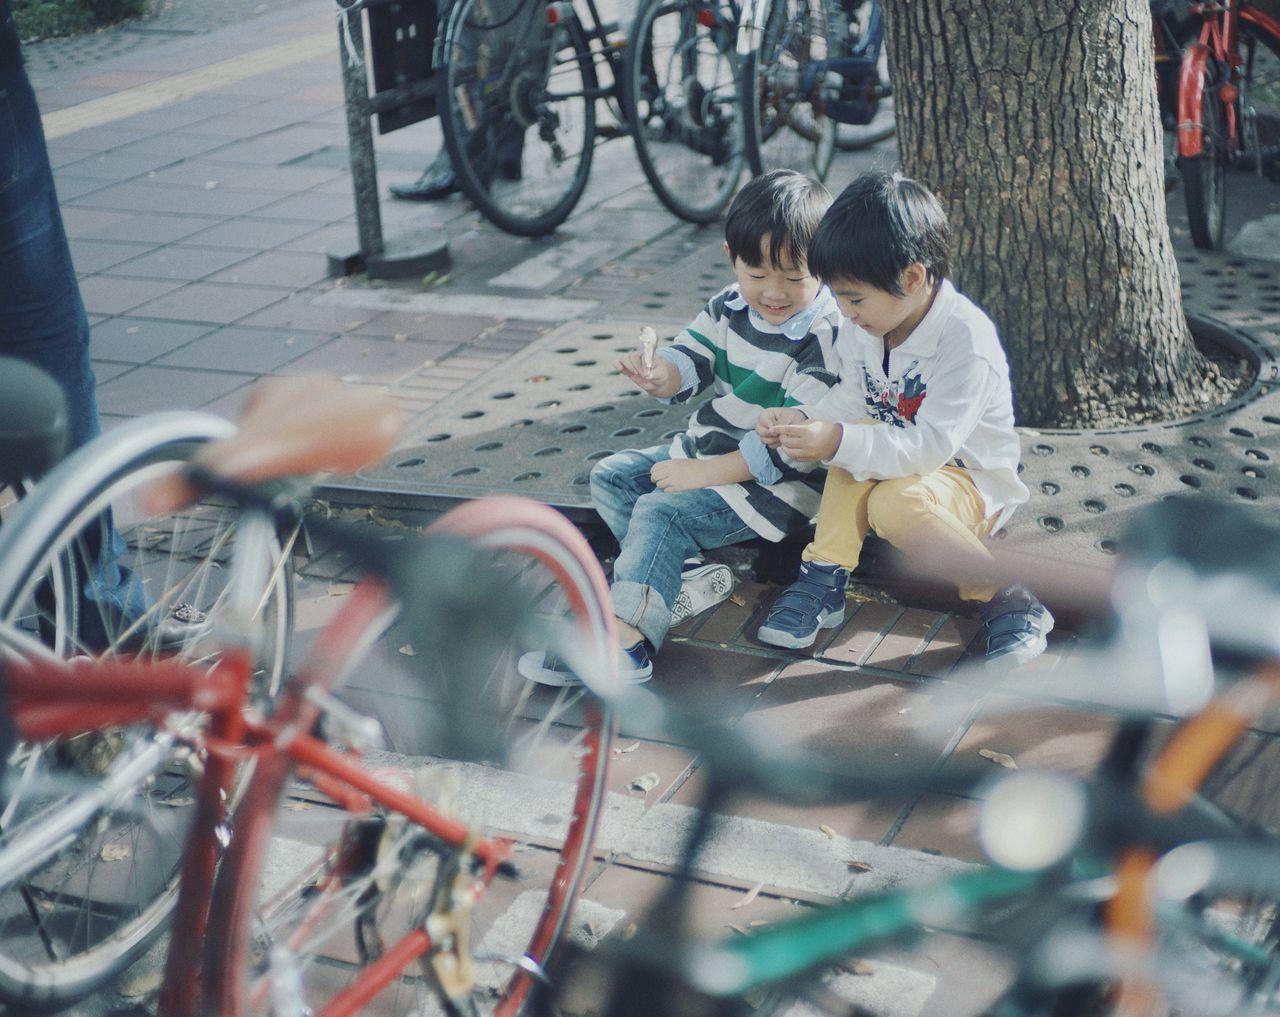 Japan Photography Fukuoka,Japan Japan Young Kids Bicycle Friendship Young Wild And Free(;